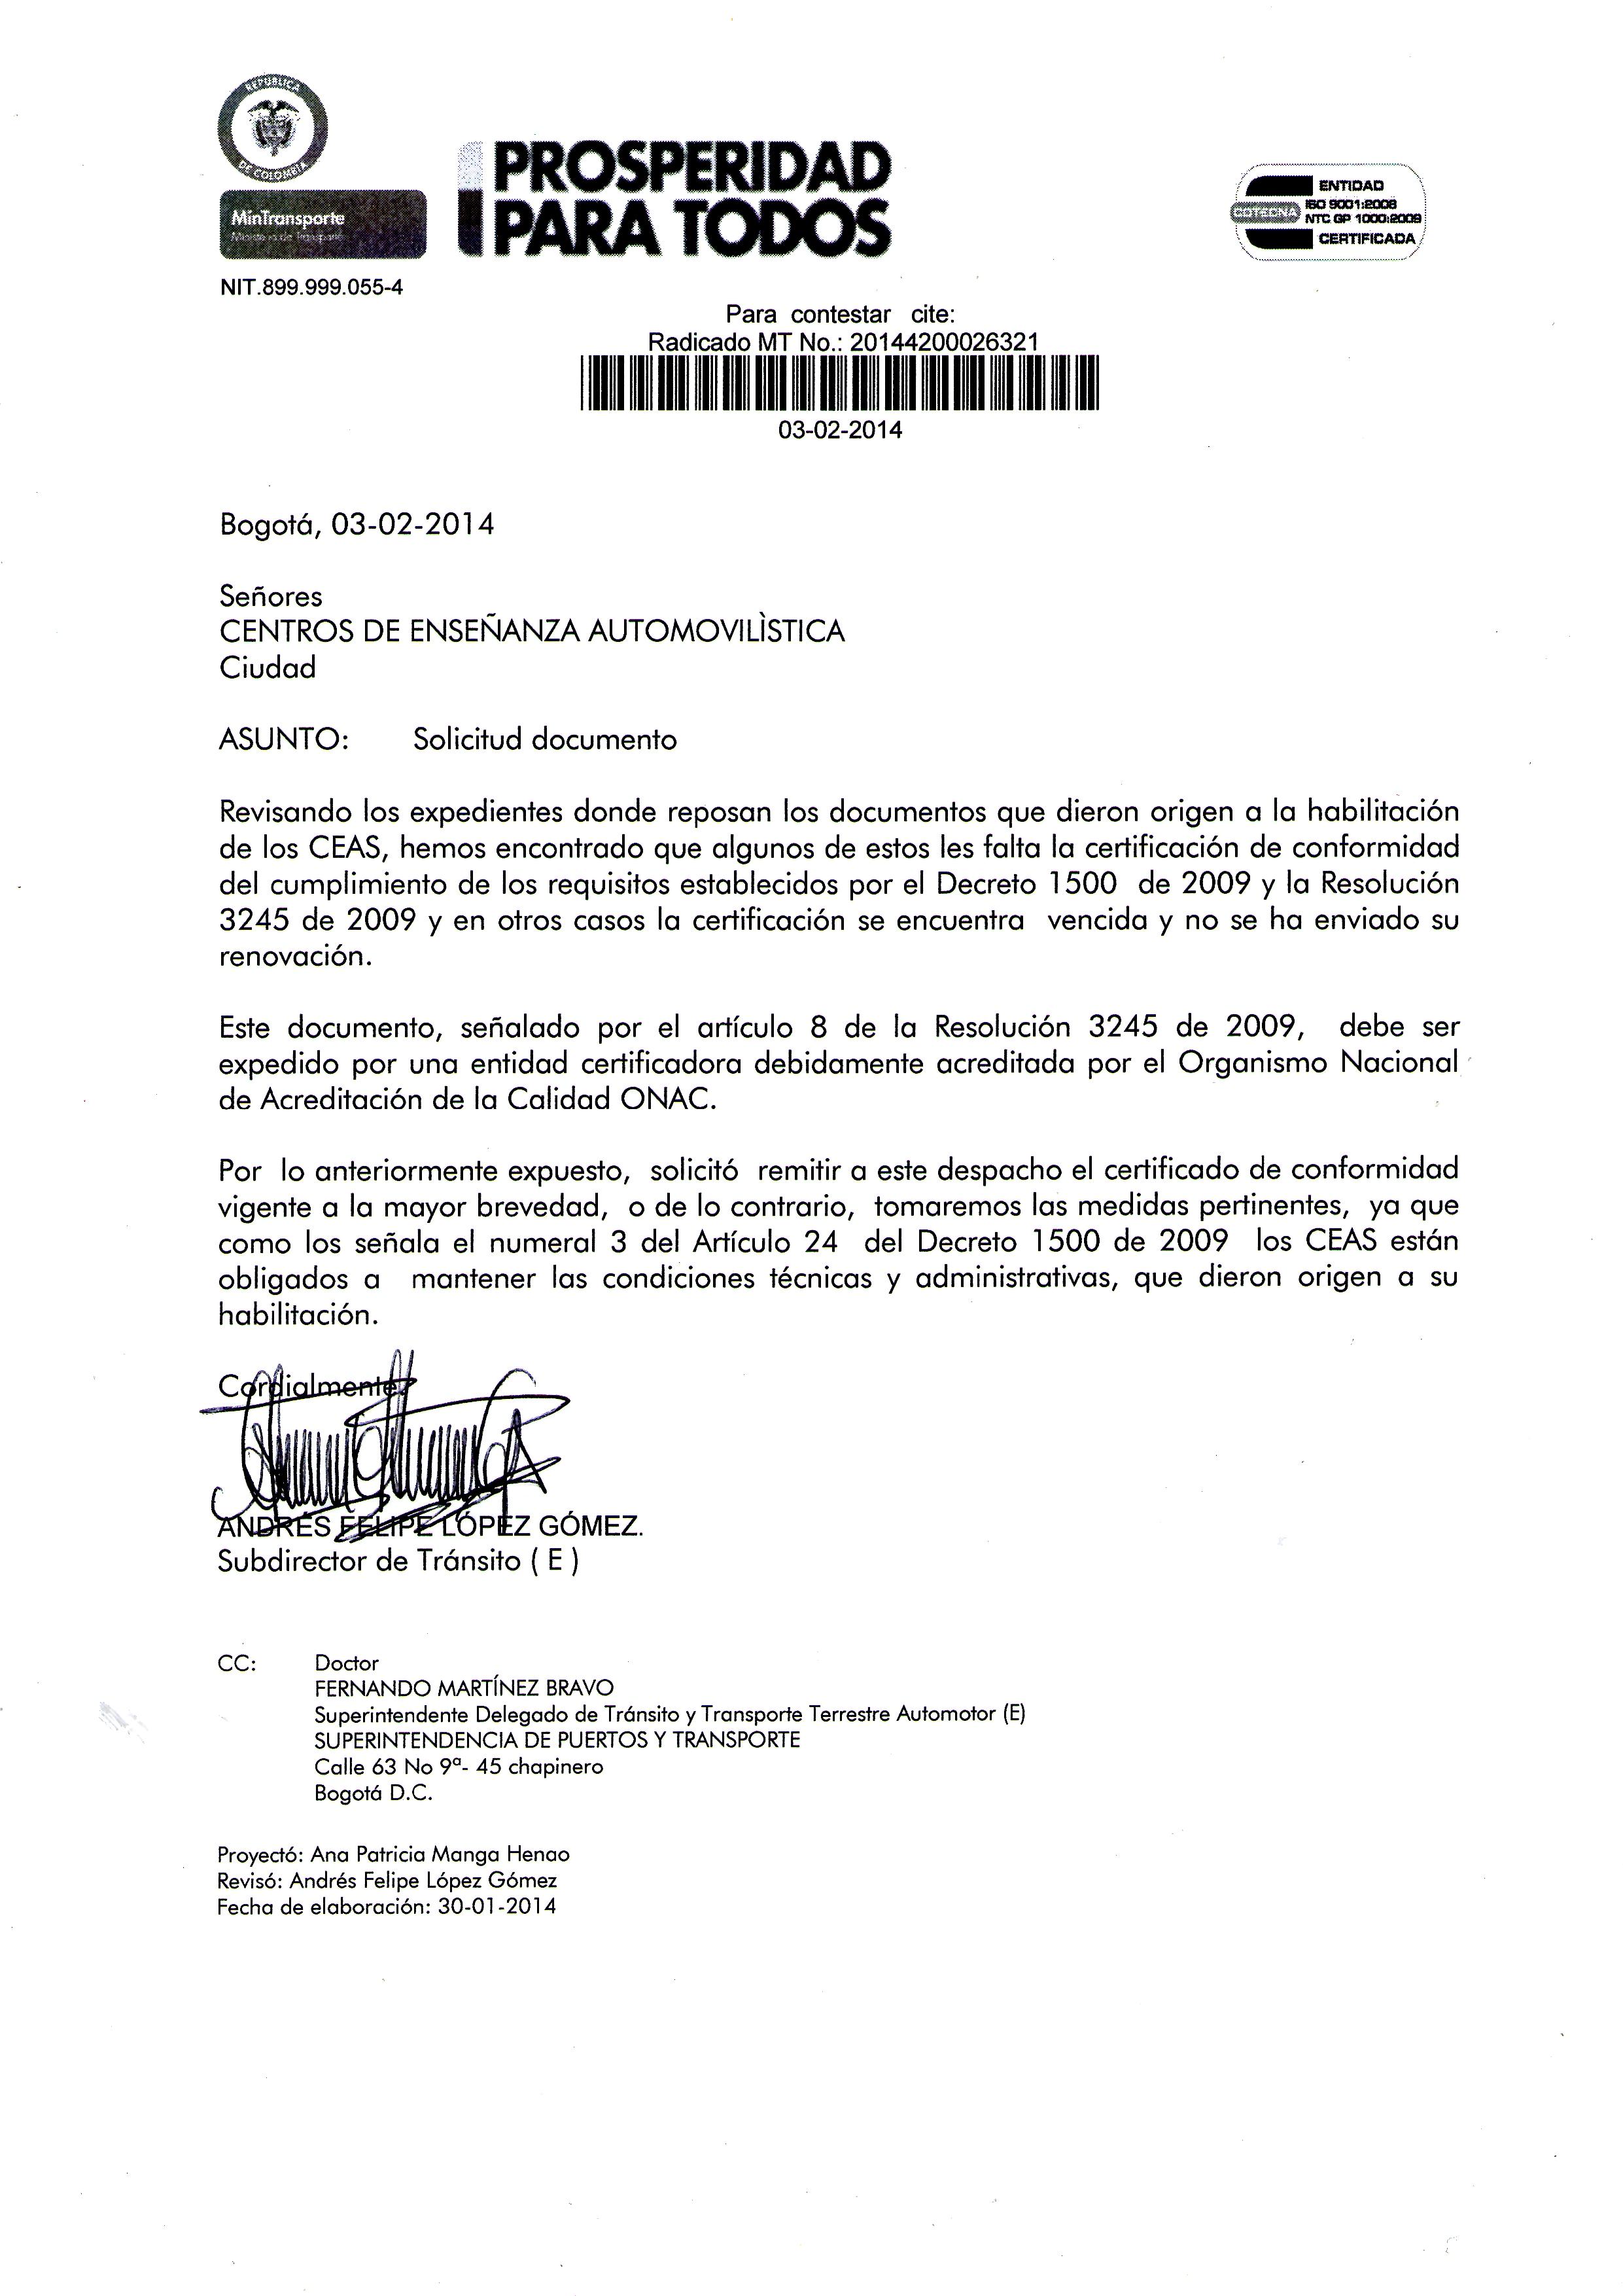 Circulares | Ministerio de Transporte de Colombia